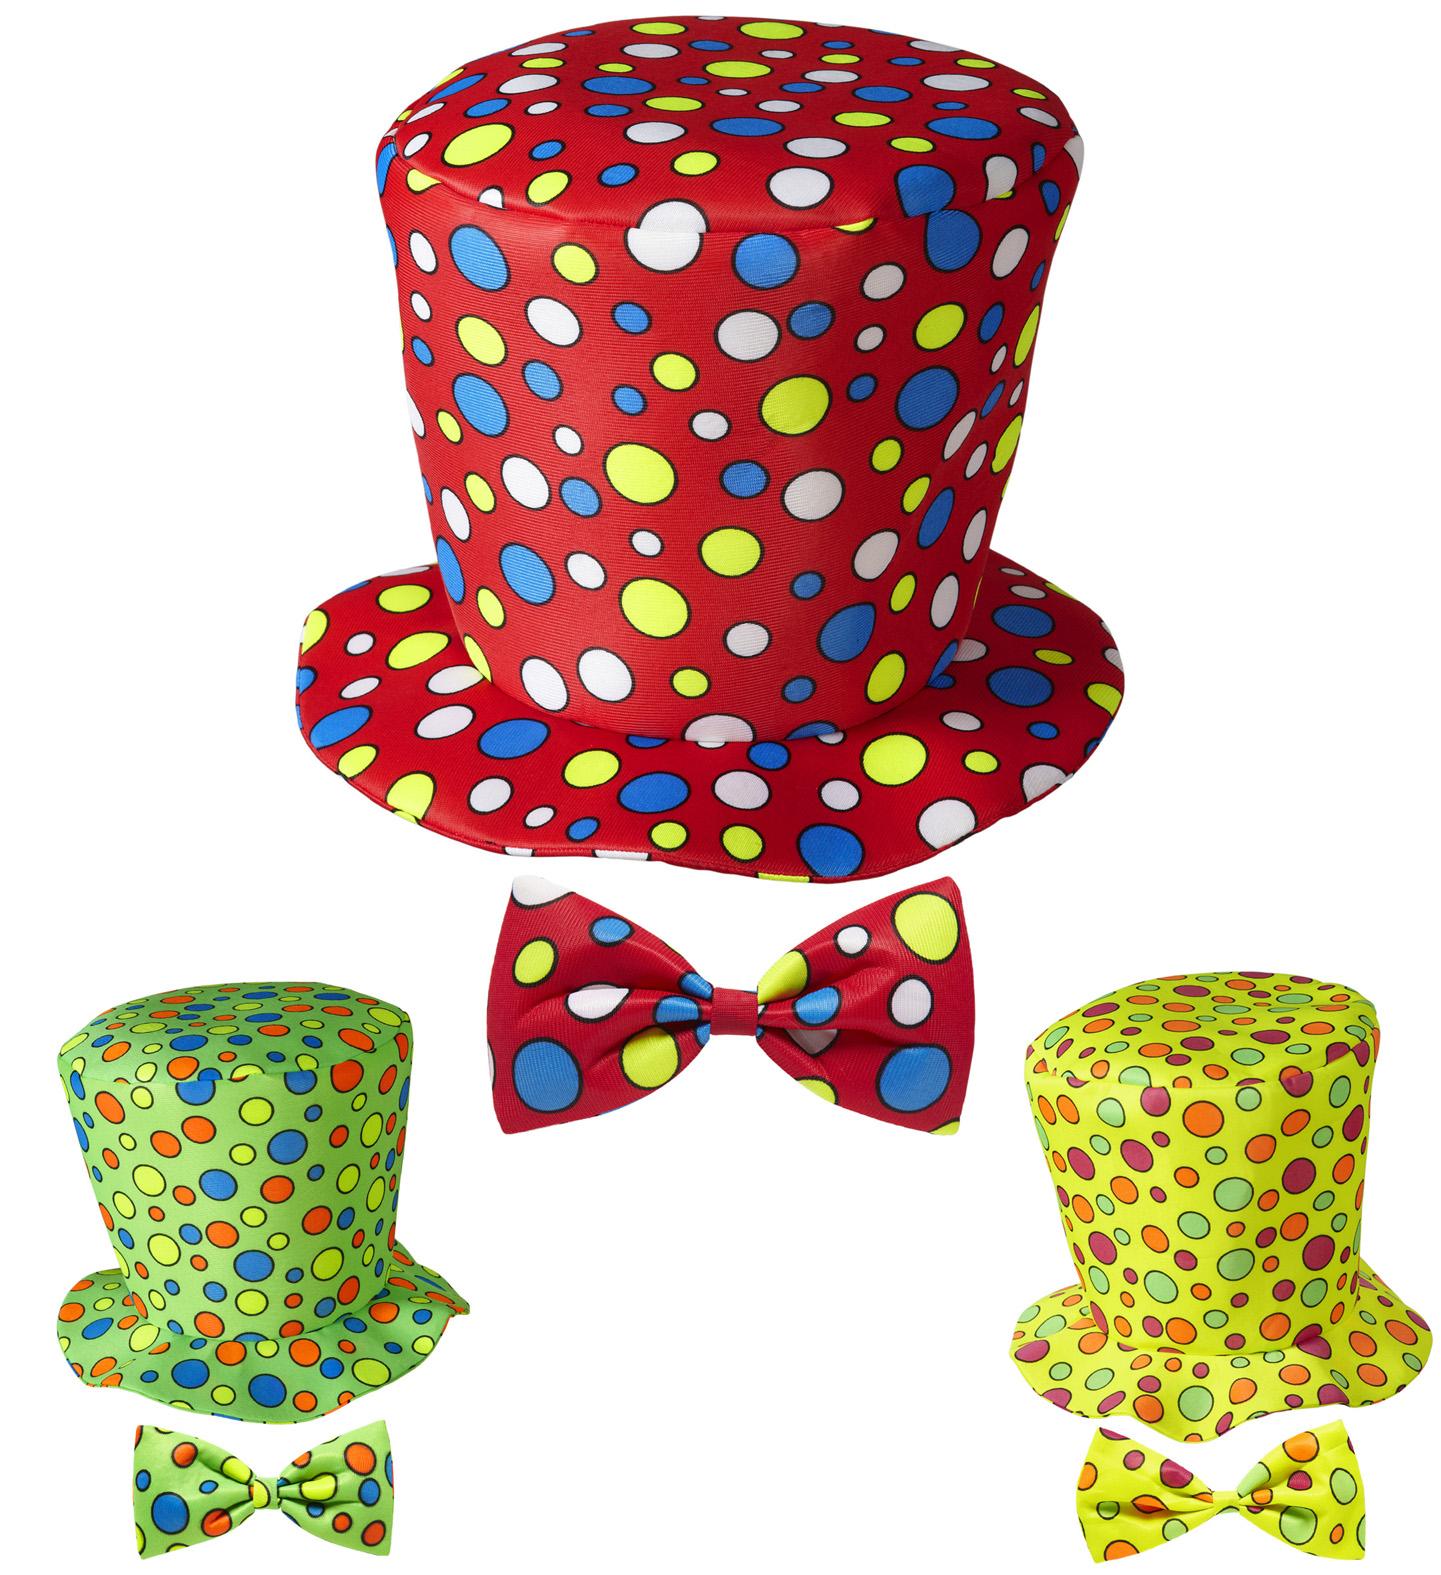 4860219d8a4 Puntíkatý klaunský klobouk a motýlek